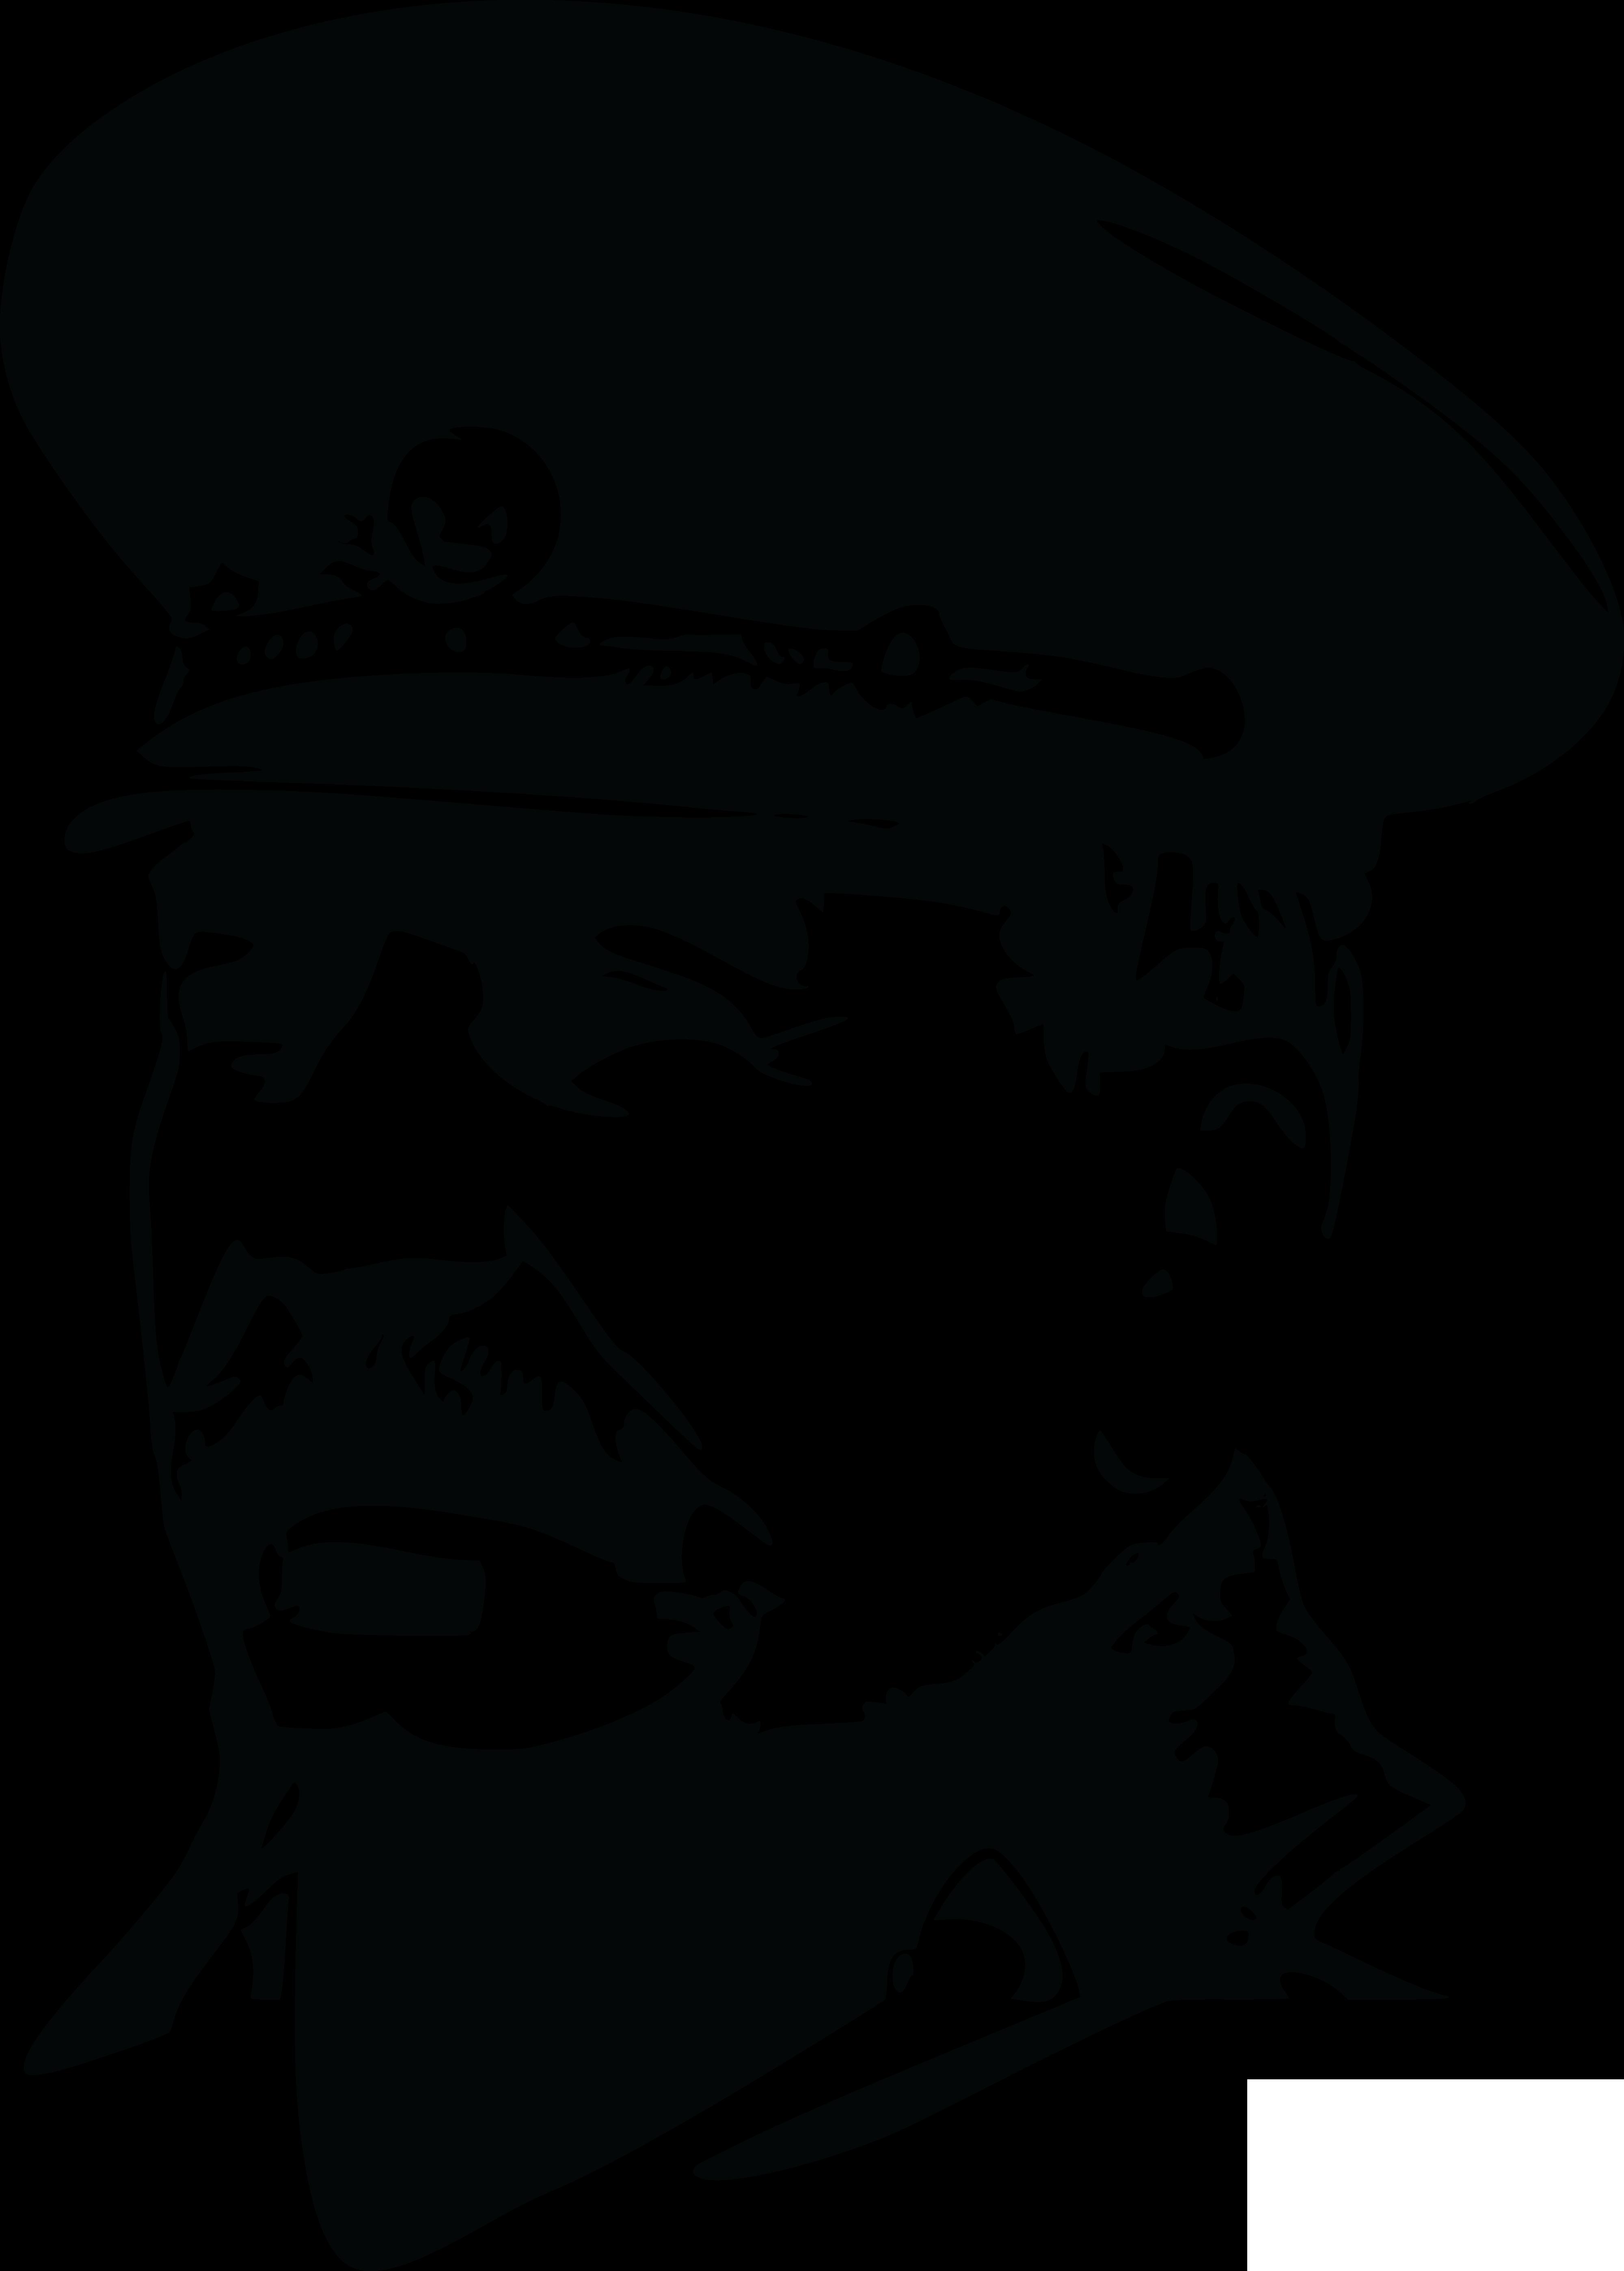 clipart royalty free Stalin drawing. Joseph at getdrawings com.